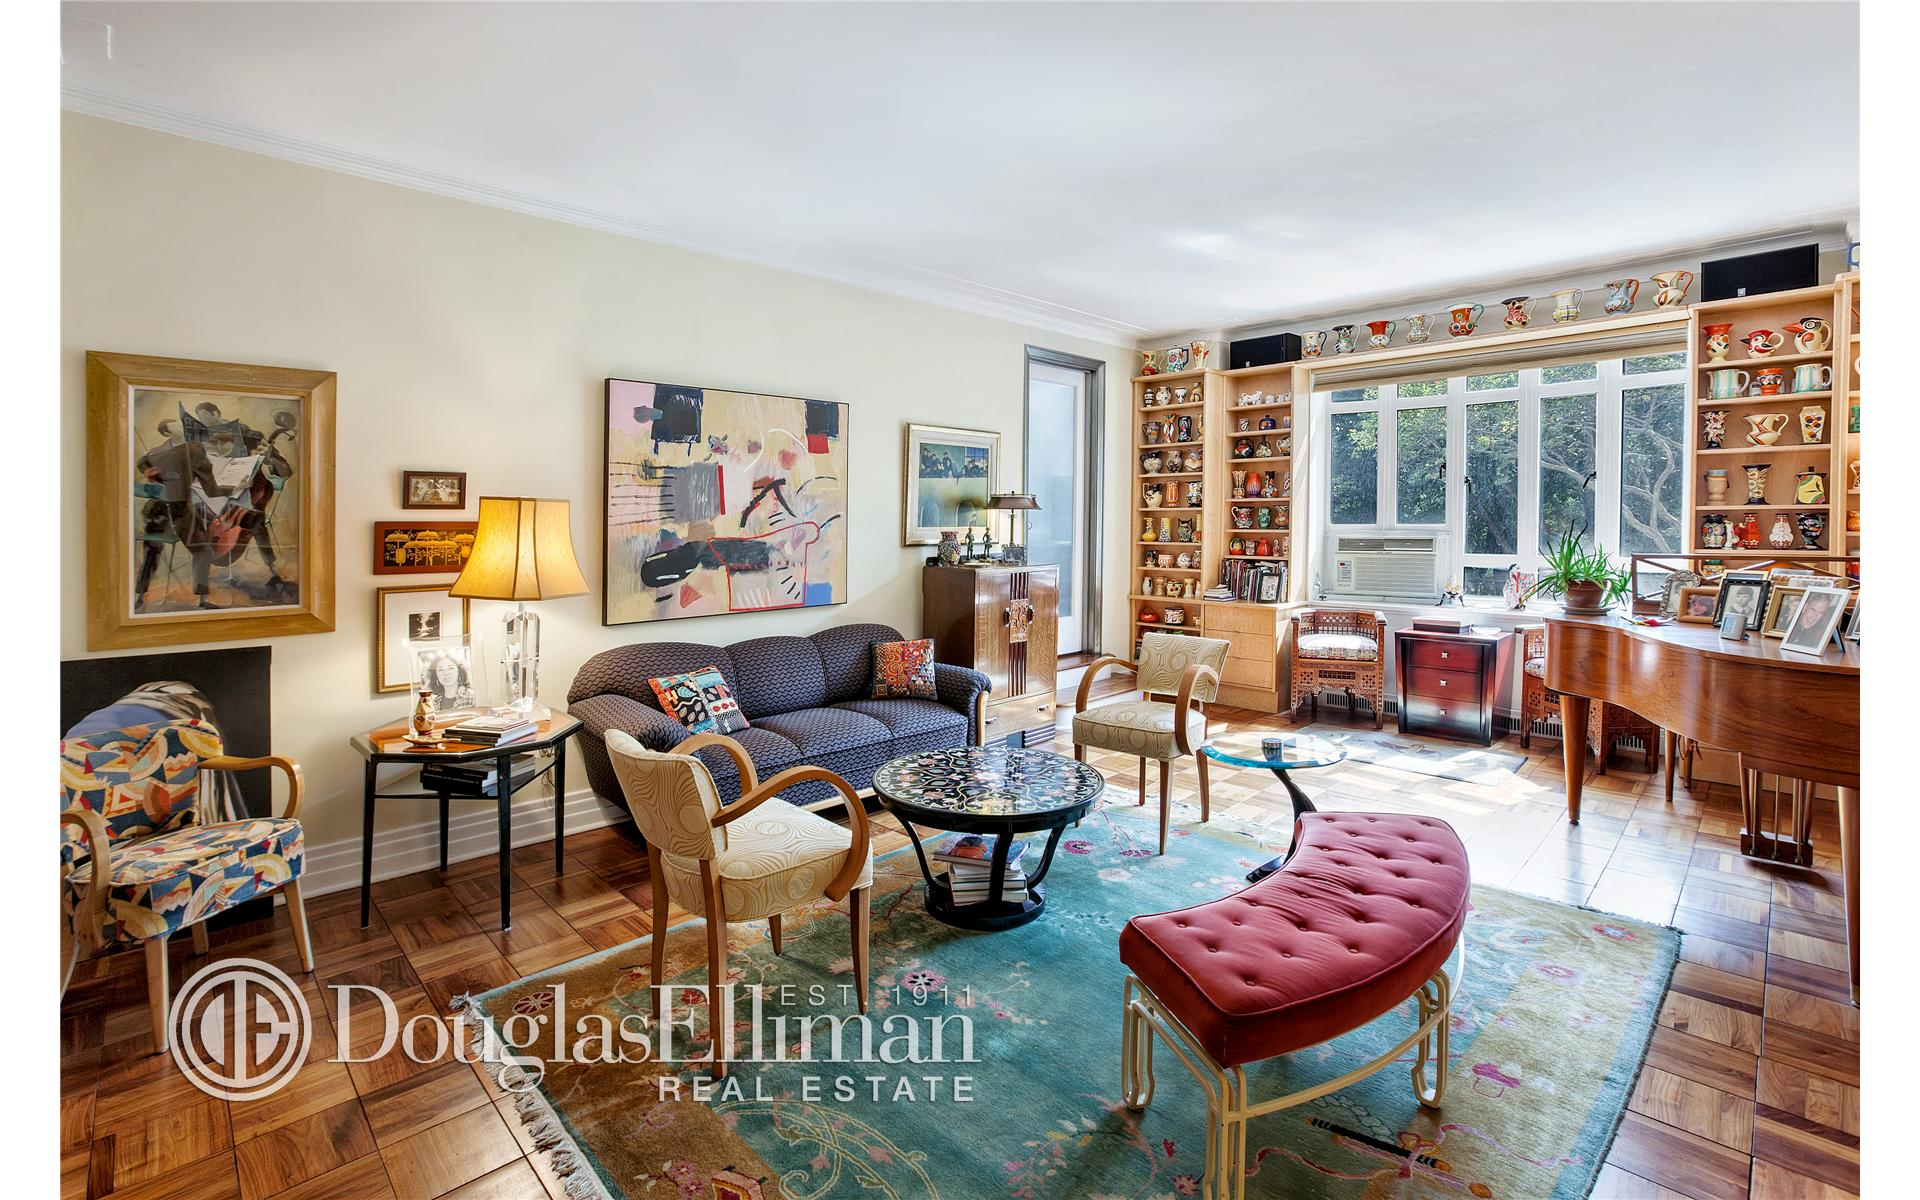 Condominium for Sale at CENTURY, Century, 25 Central Park West New York, New York 10023 United States